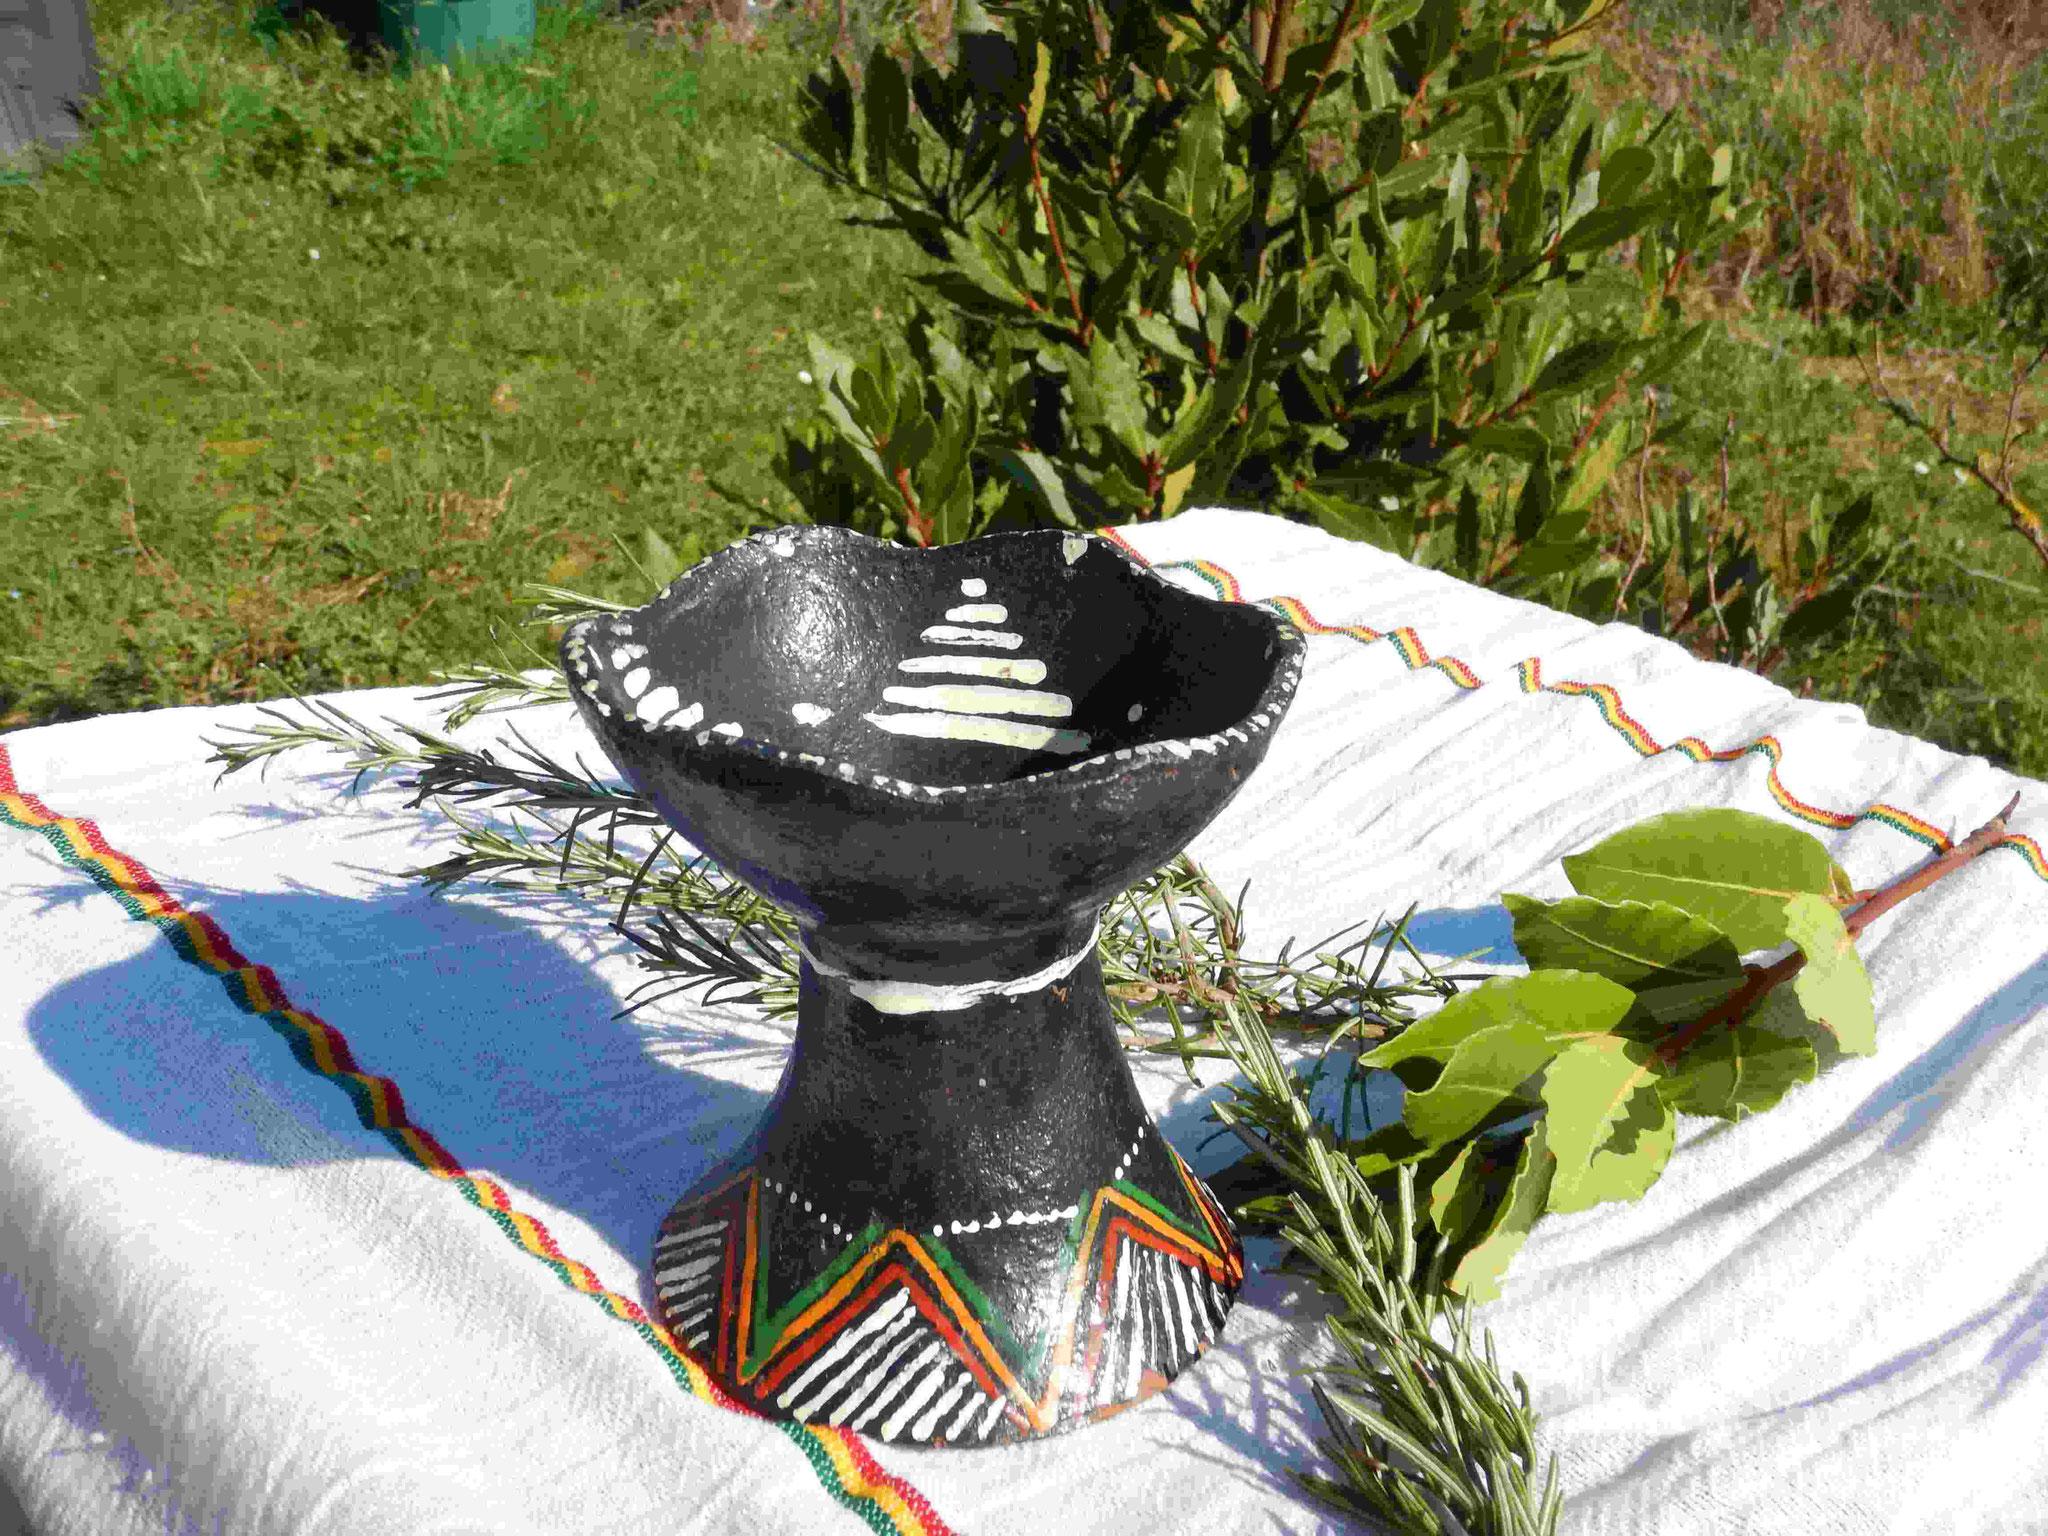 Ethiopie Artisanat ethiopien Café Epices éthiopiennes made by locals solidaire équitable artisanat textils voyage Ethiopie 2